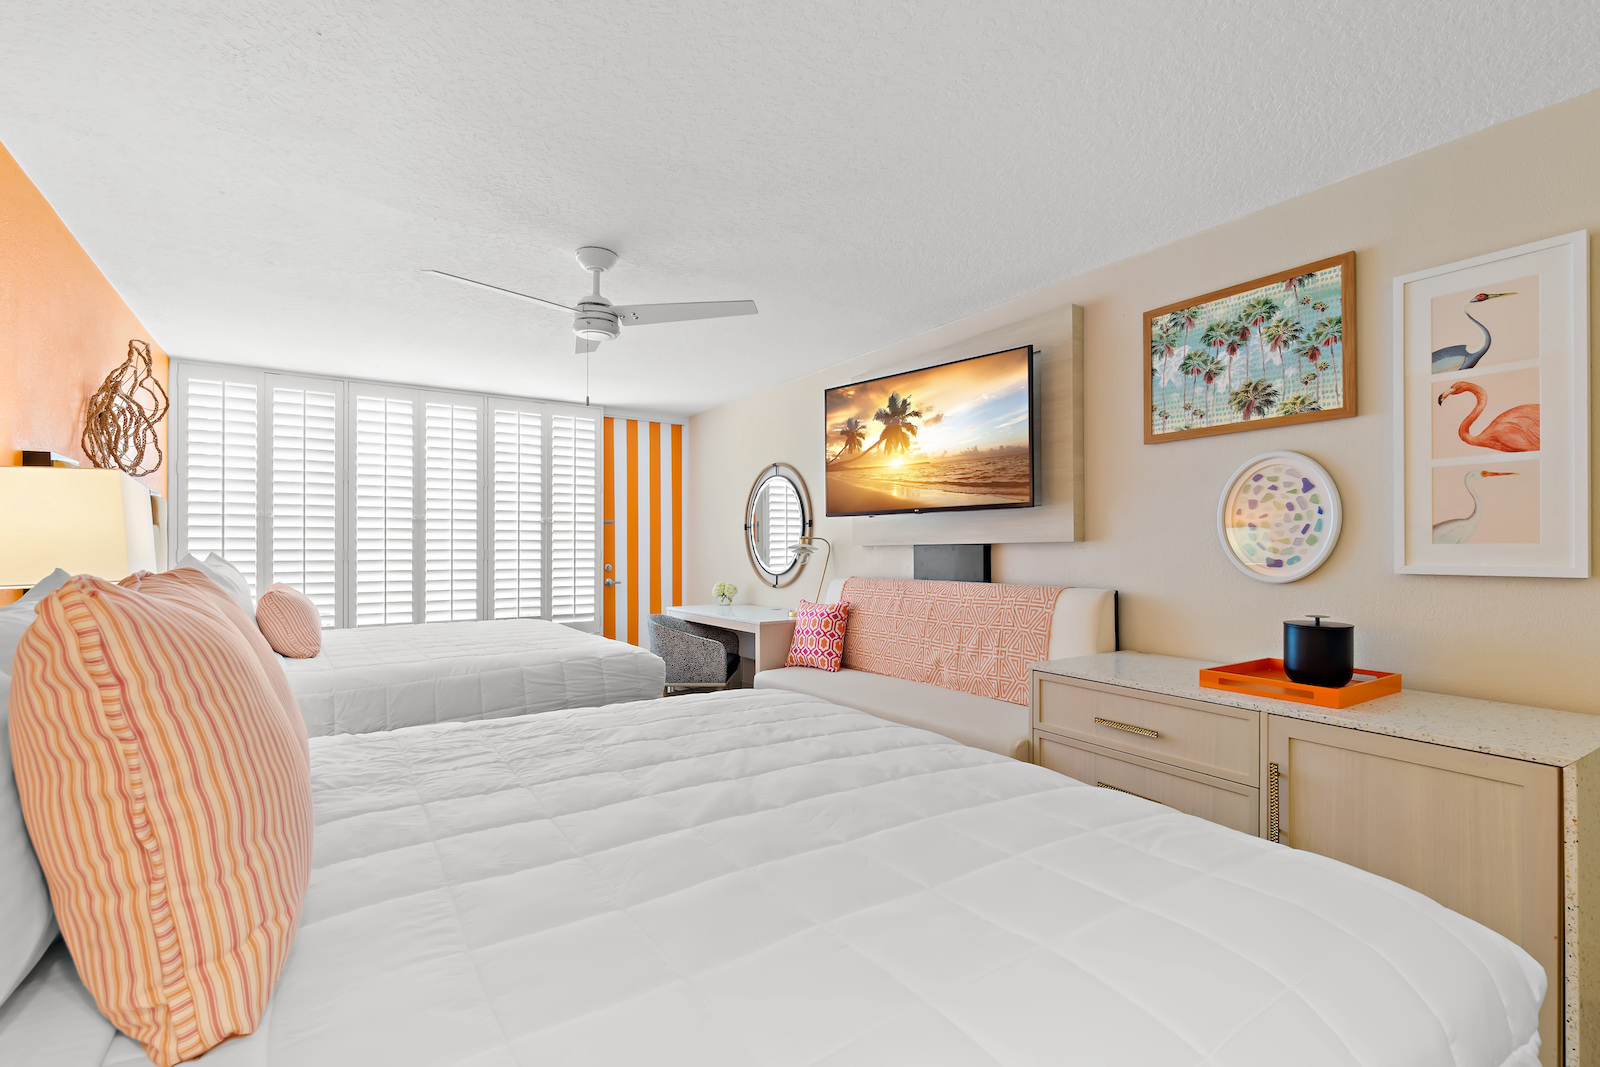 St. Pete Beach Wedding Venue Hotel Room Bellwether Beach Resort